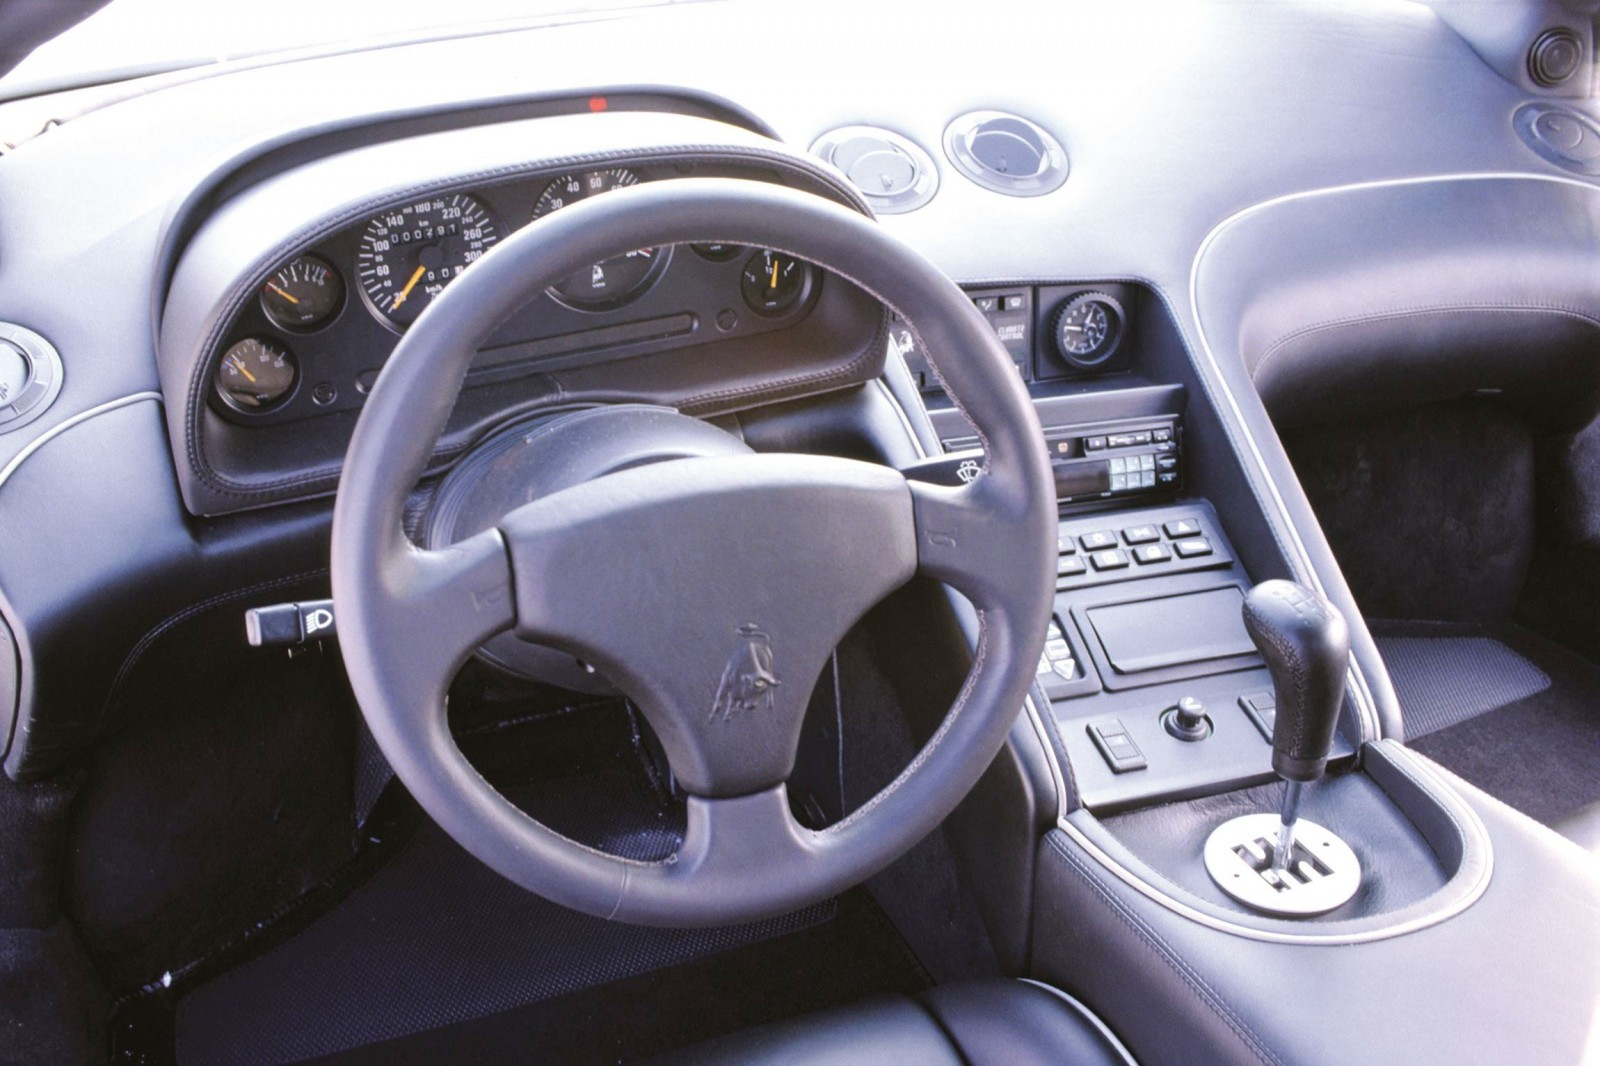 http://www.car-revs-daily.com/wp-content/uploads/1993-Lamborghini-Diablo-VT-8-1600x1066.jpg